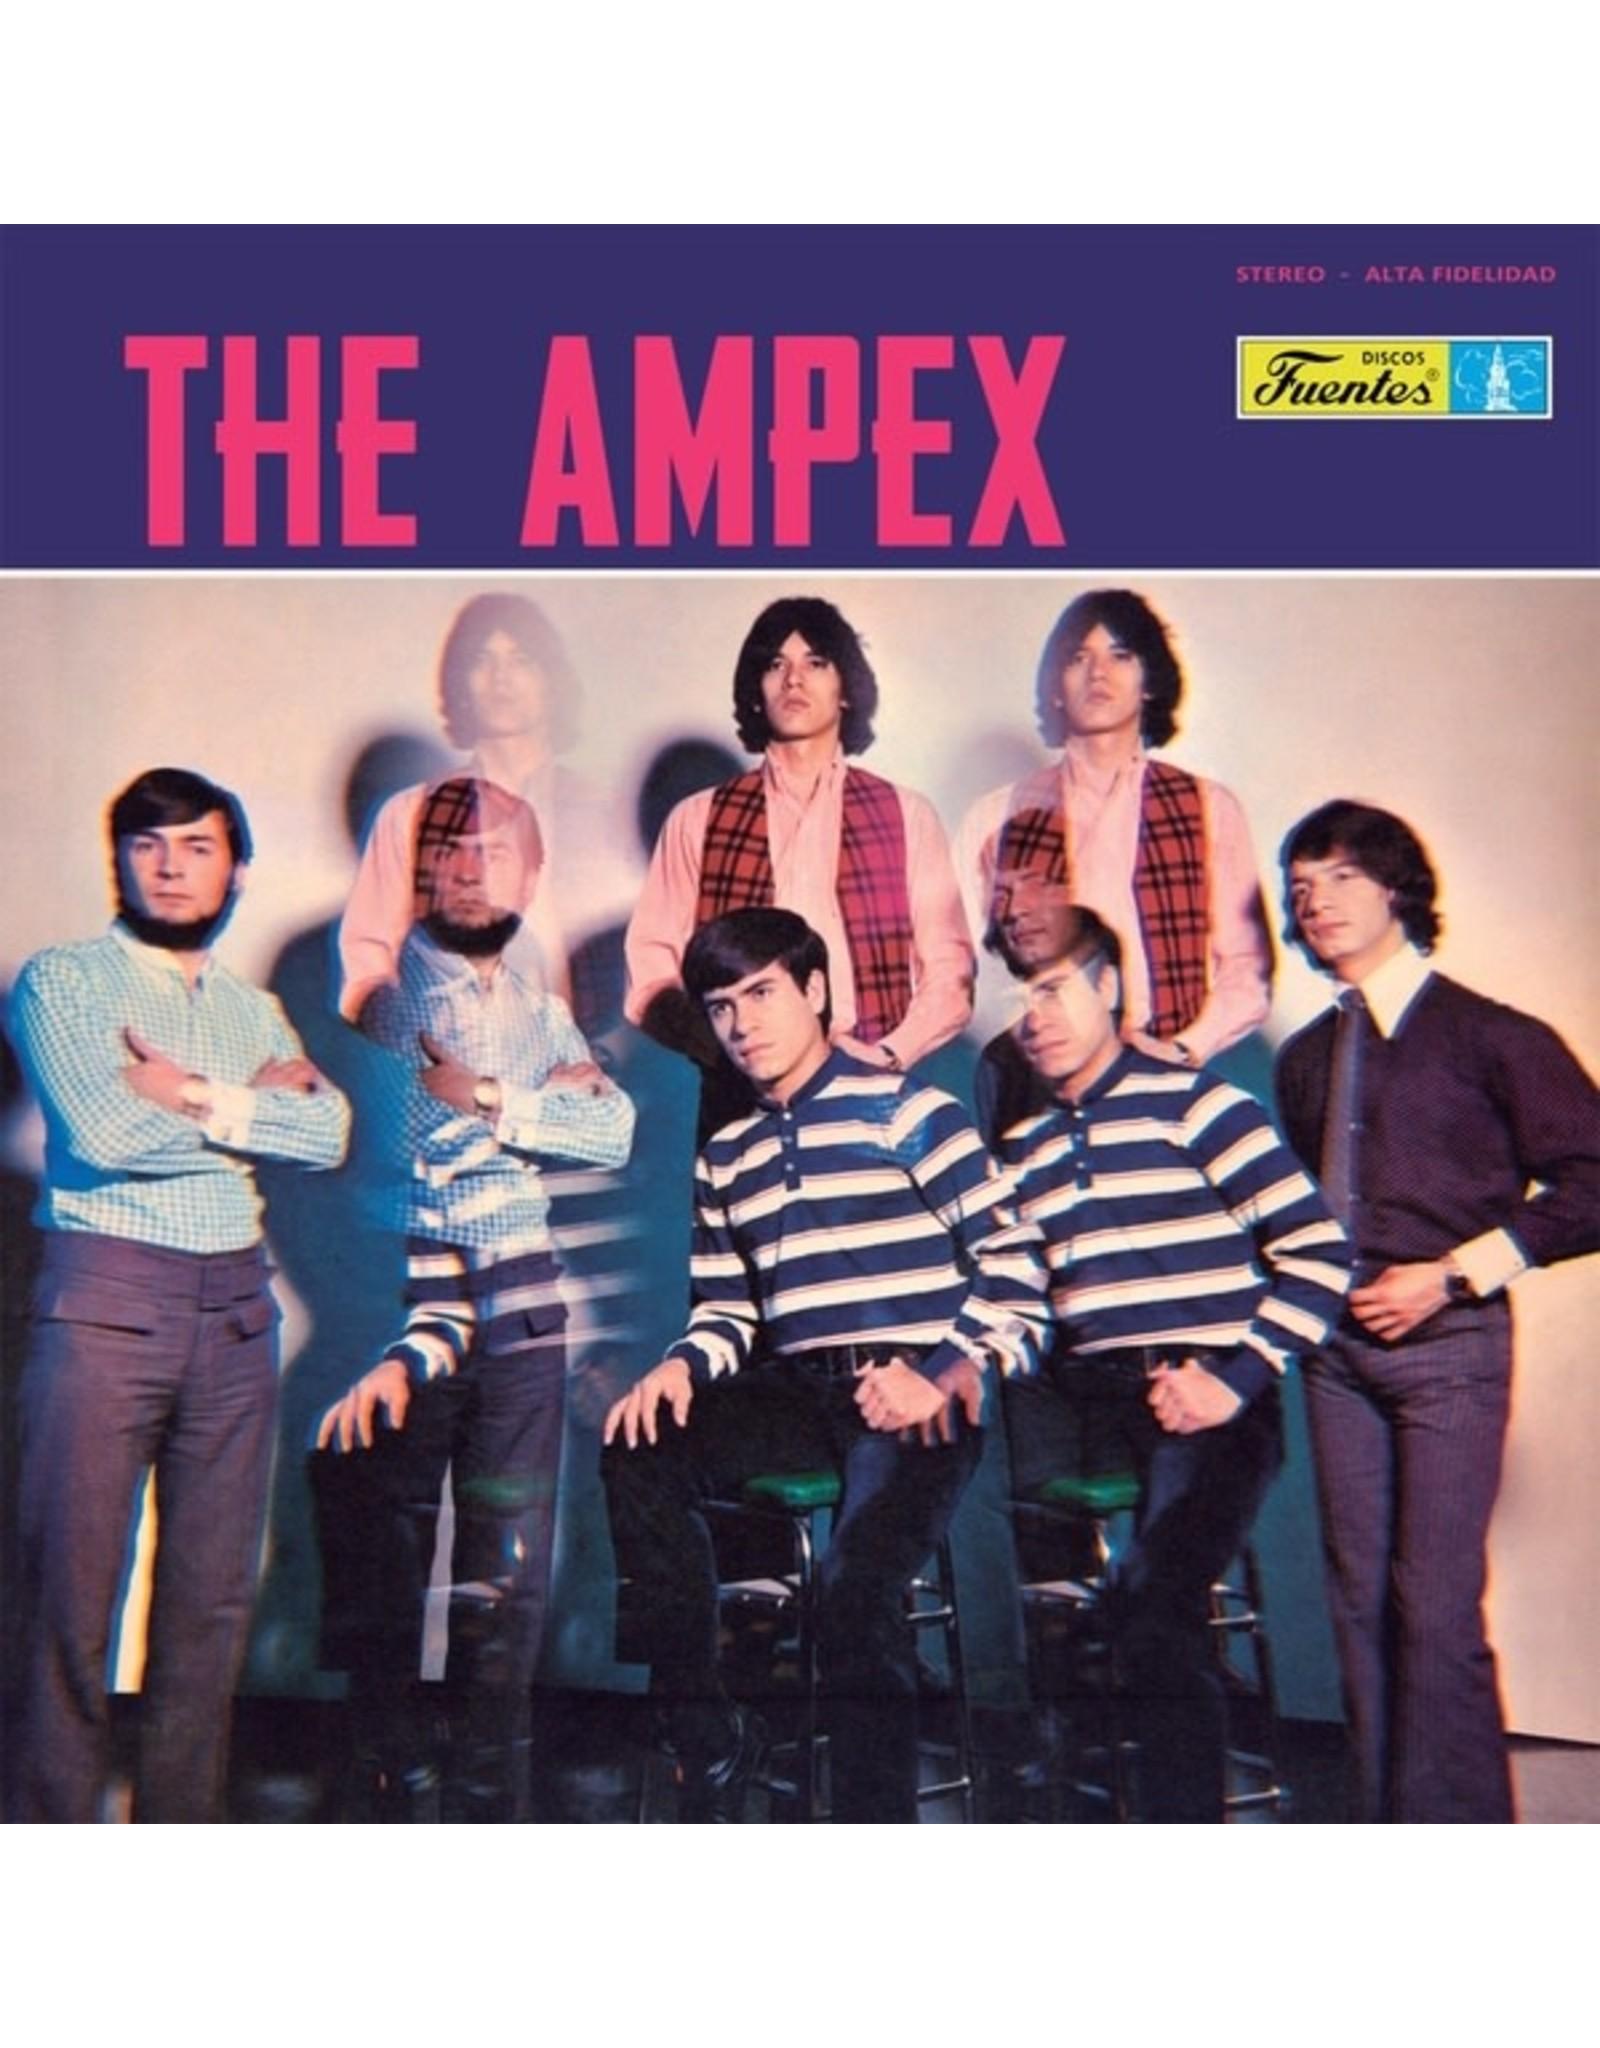 New Vinyl The Ampex - S/T LP